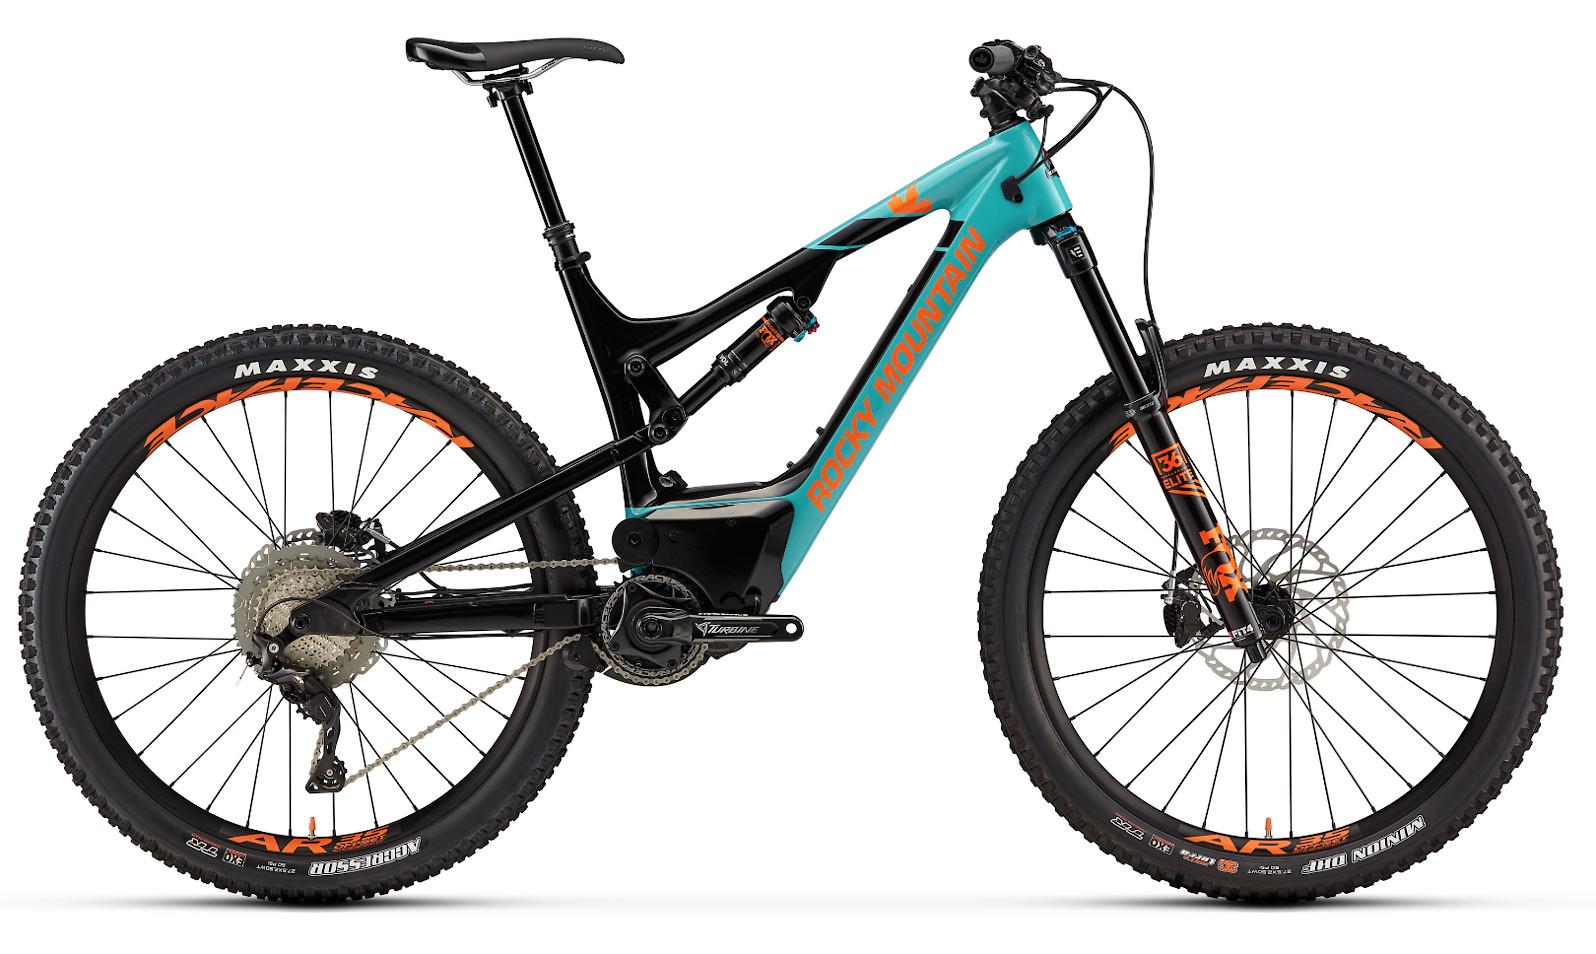 2019 Rocky Mountain Altitude Powerplay Carbon 70 - Turquoise and orange